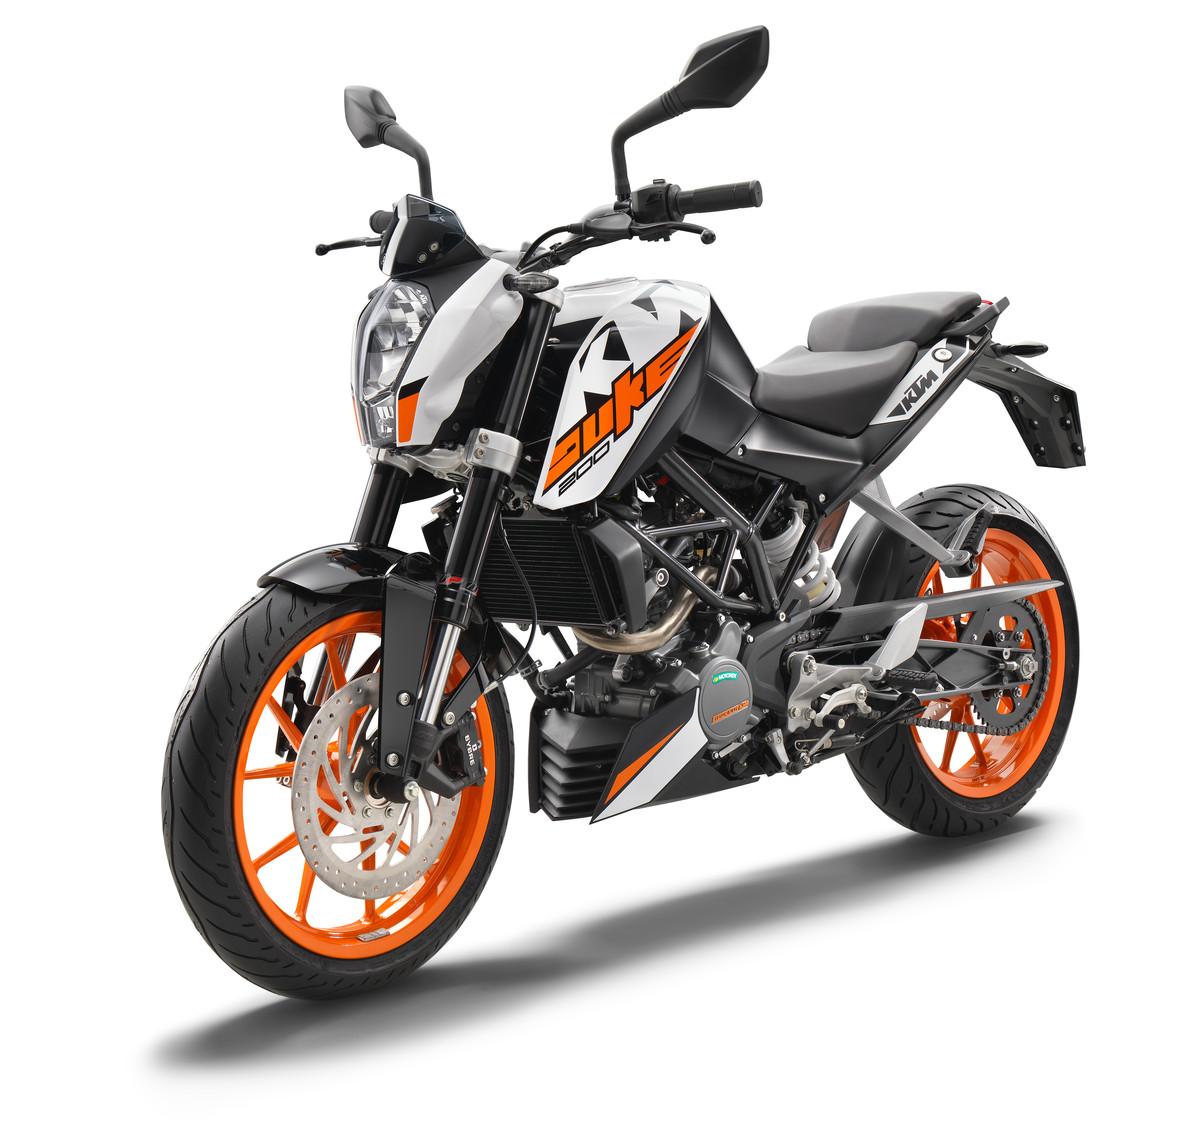 KTM-Duke-200-2018-gia-68-trieu-dong-tai-Malaysia-anh-2